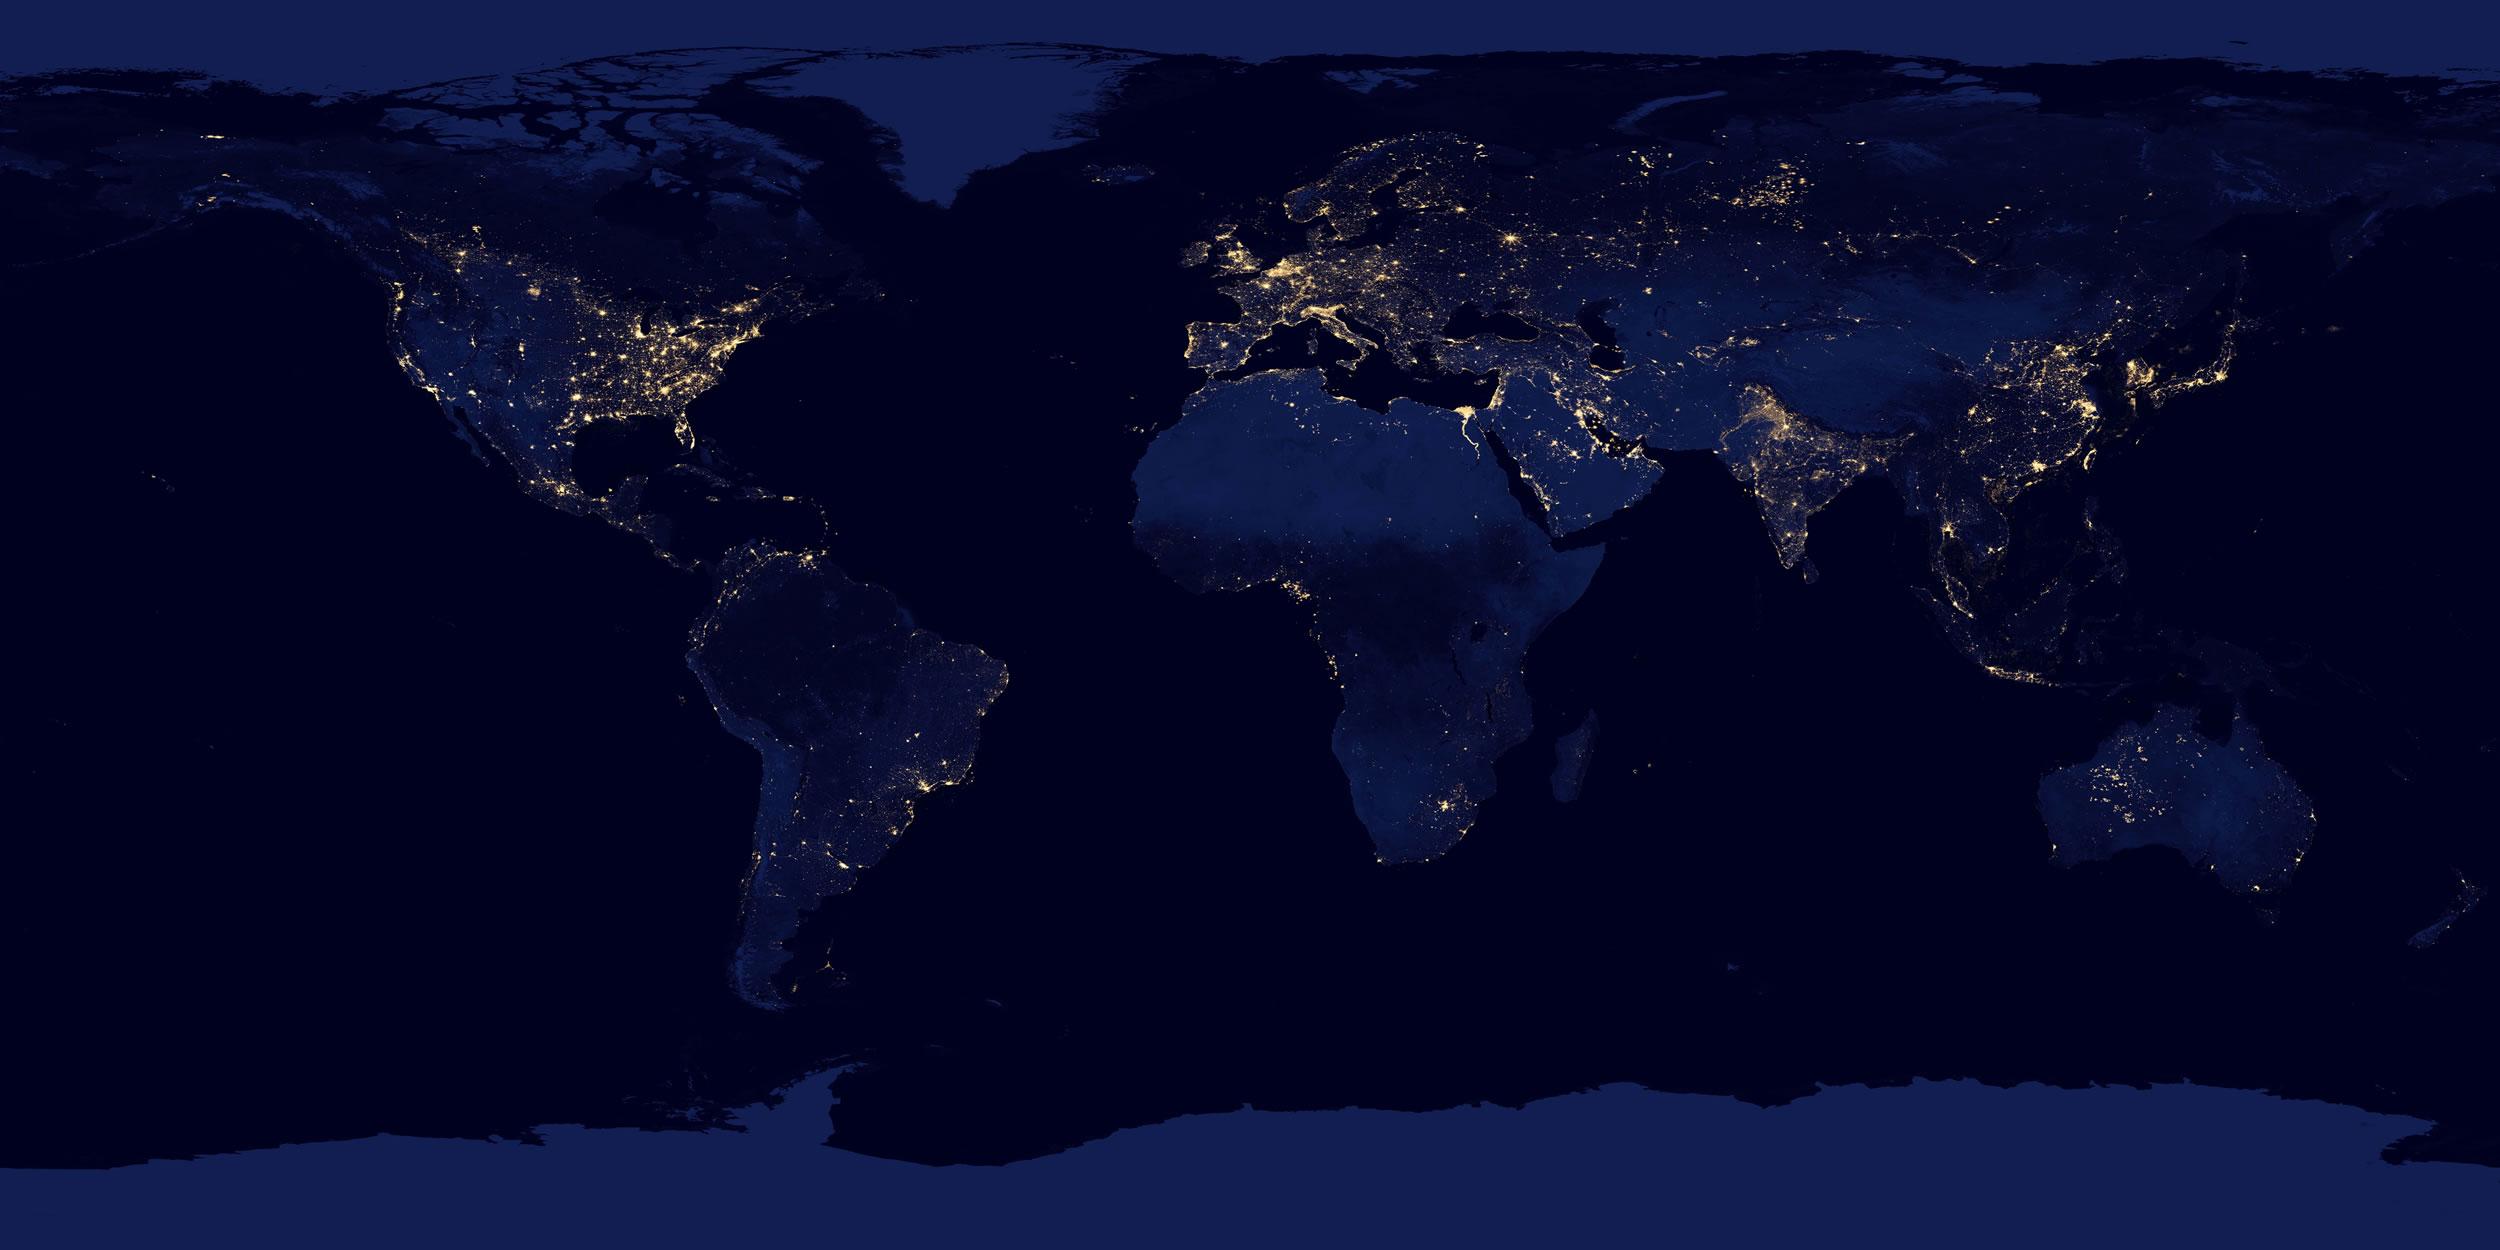 Le monde, la nuit - NASA